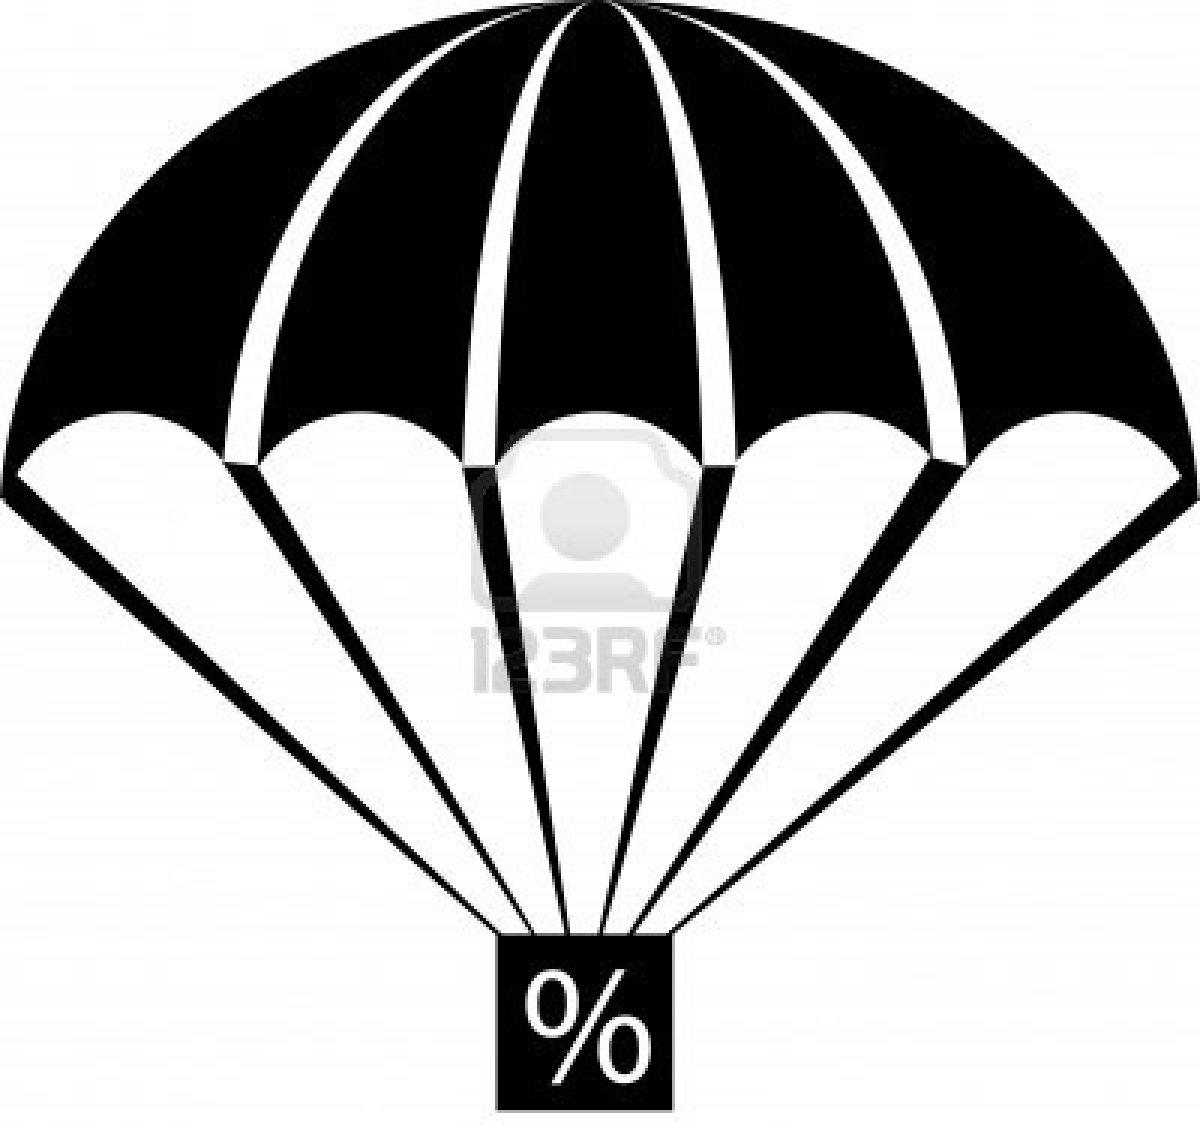 1200x1125 Parachute Clipart Vector